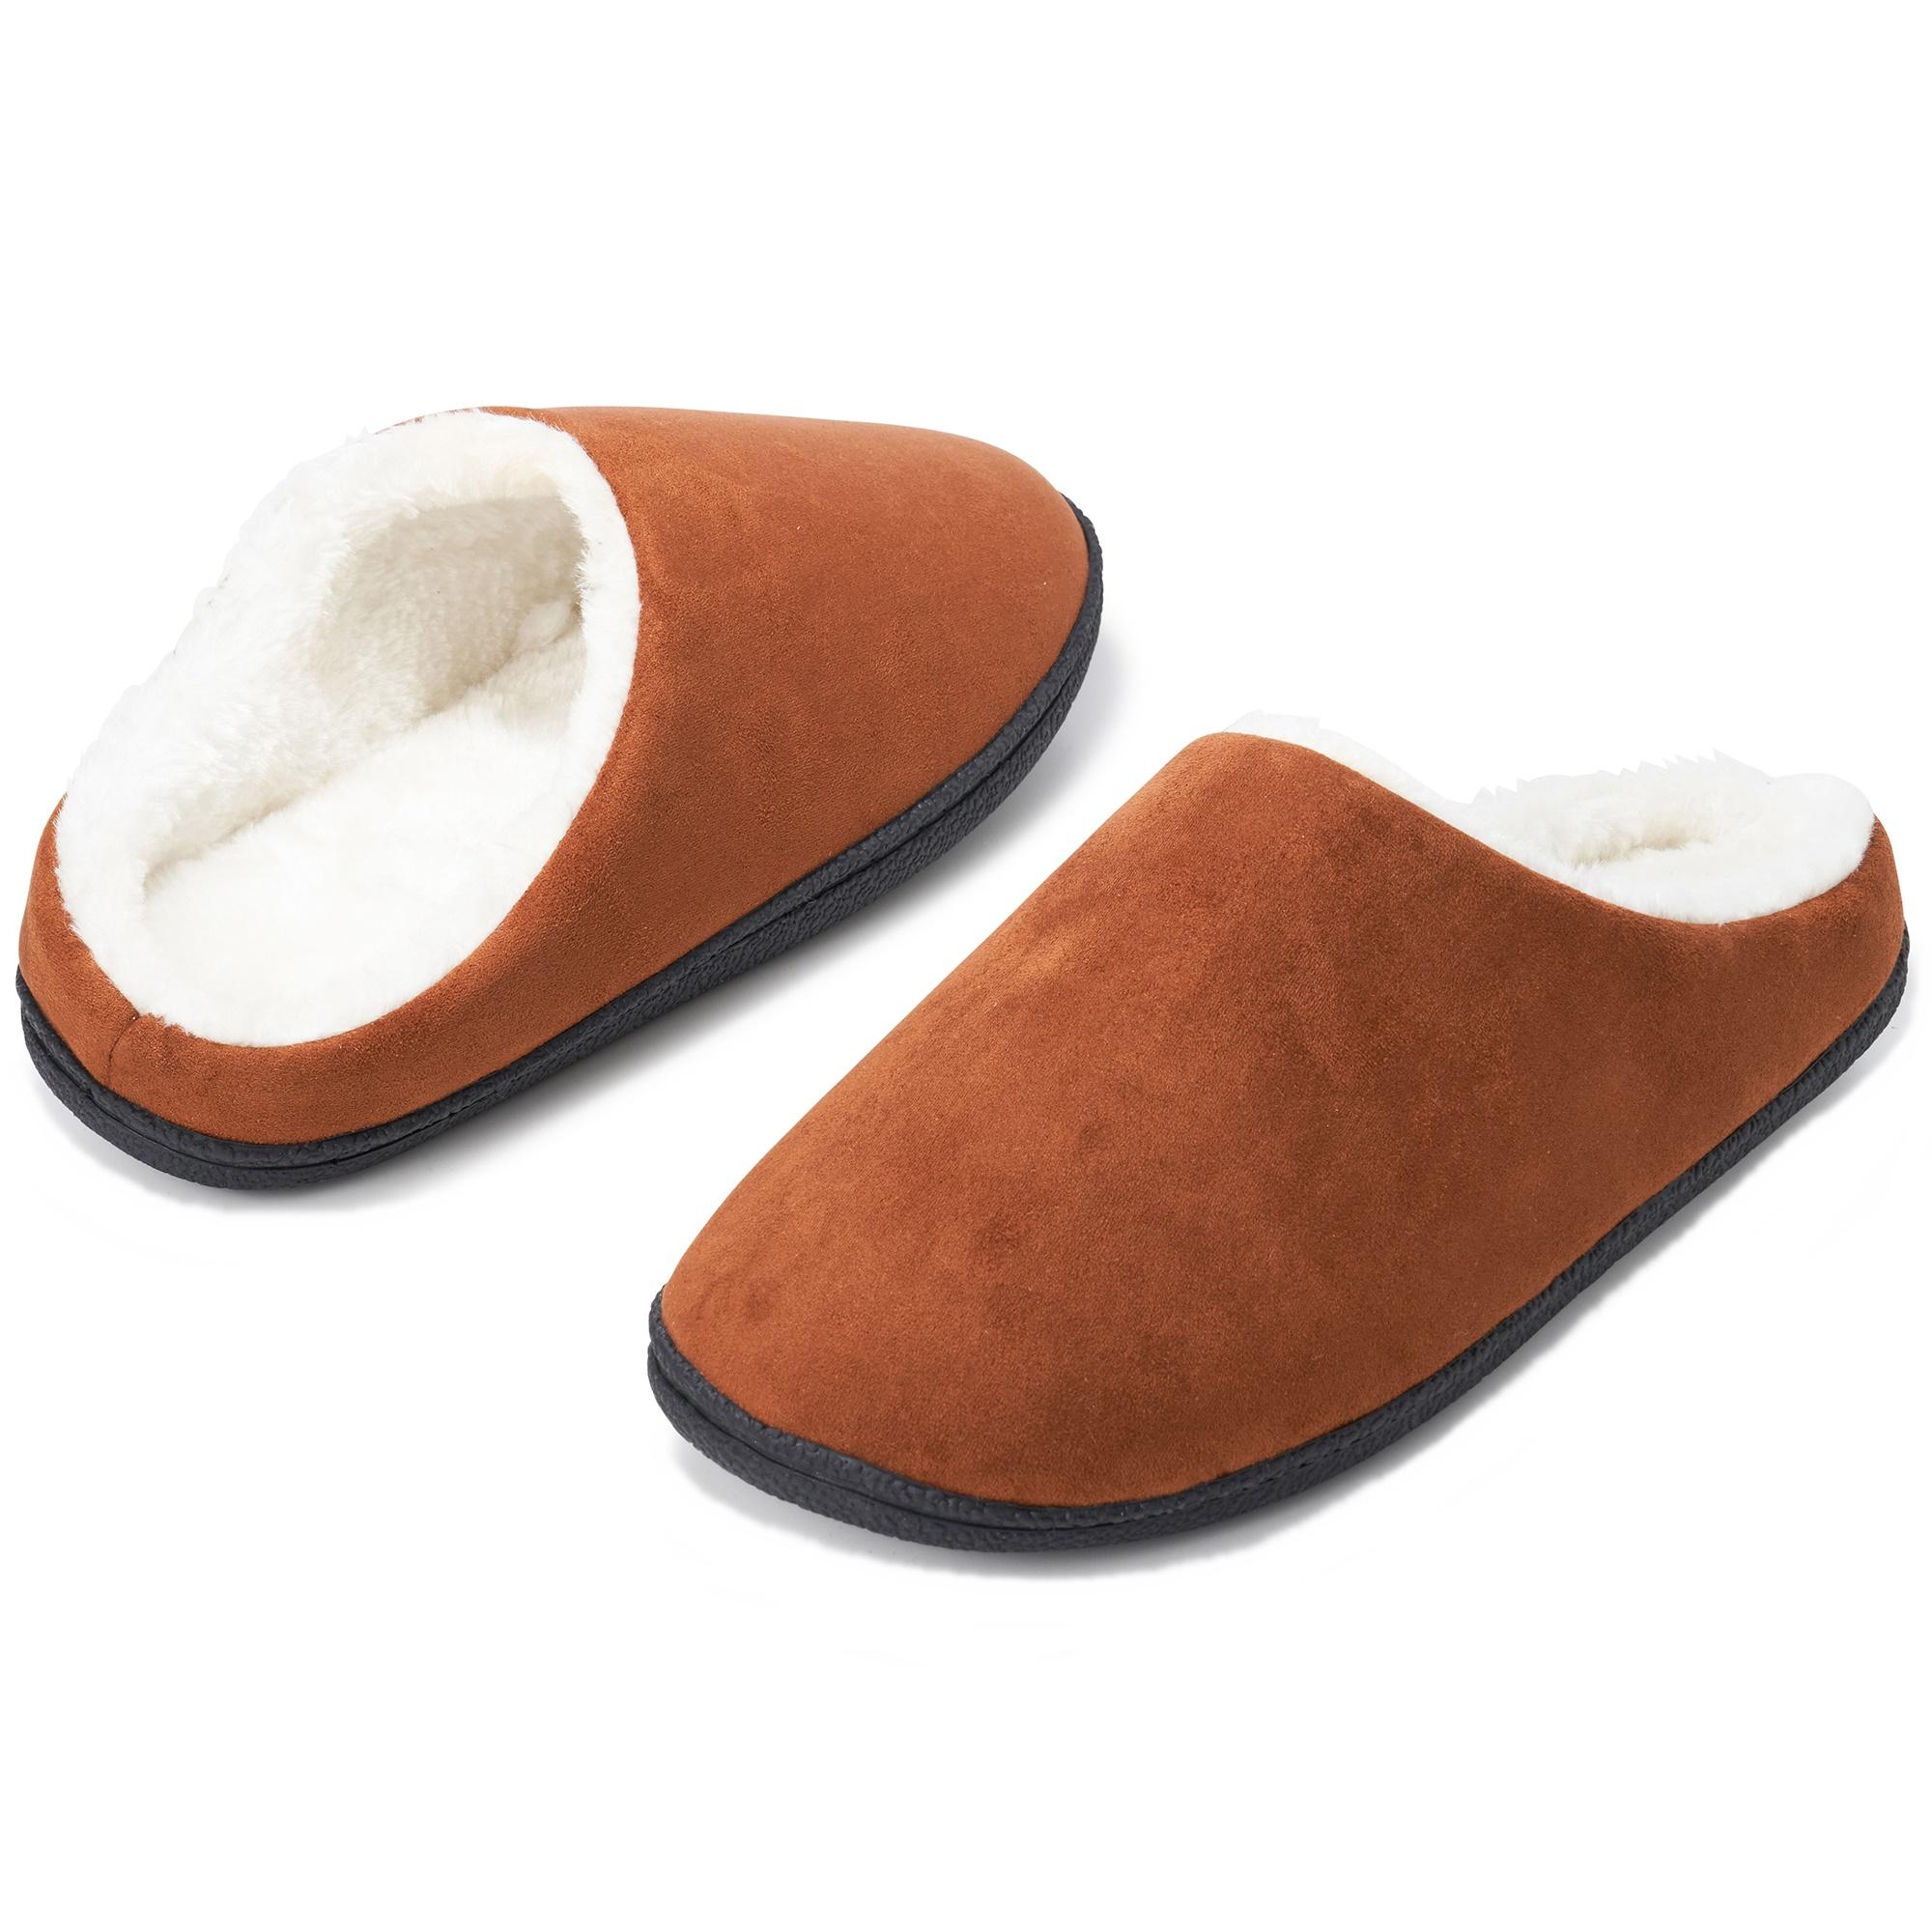 Alpine-Swiss-Mens-Memory-Foam-Clog-Slippers-Indoor-Comfort-Slip-On-House-Shoes thumbnail 20